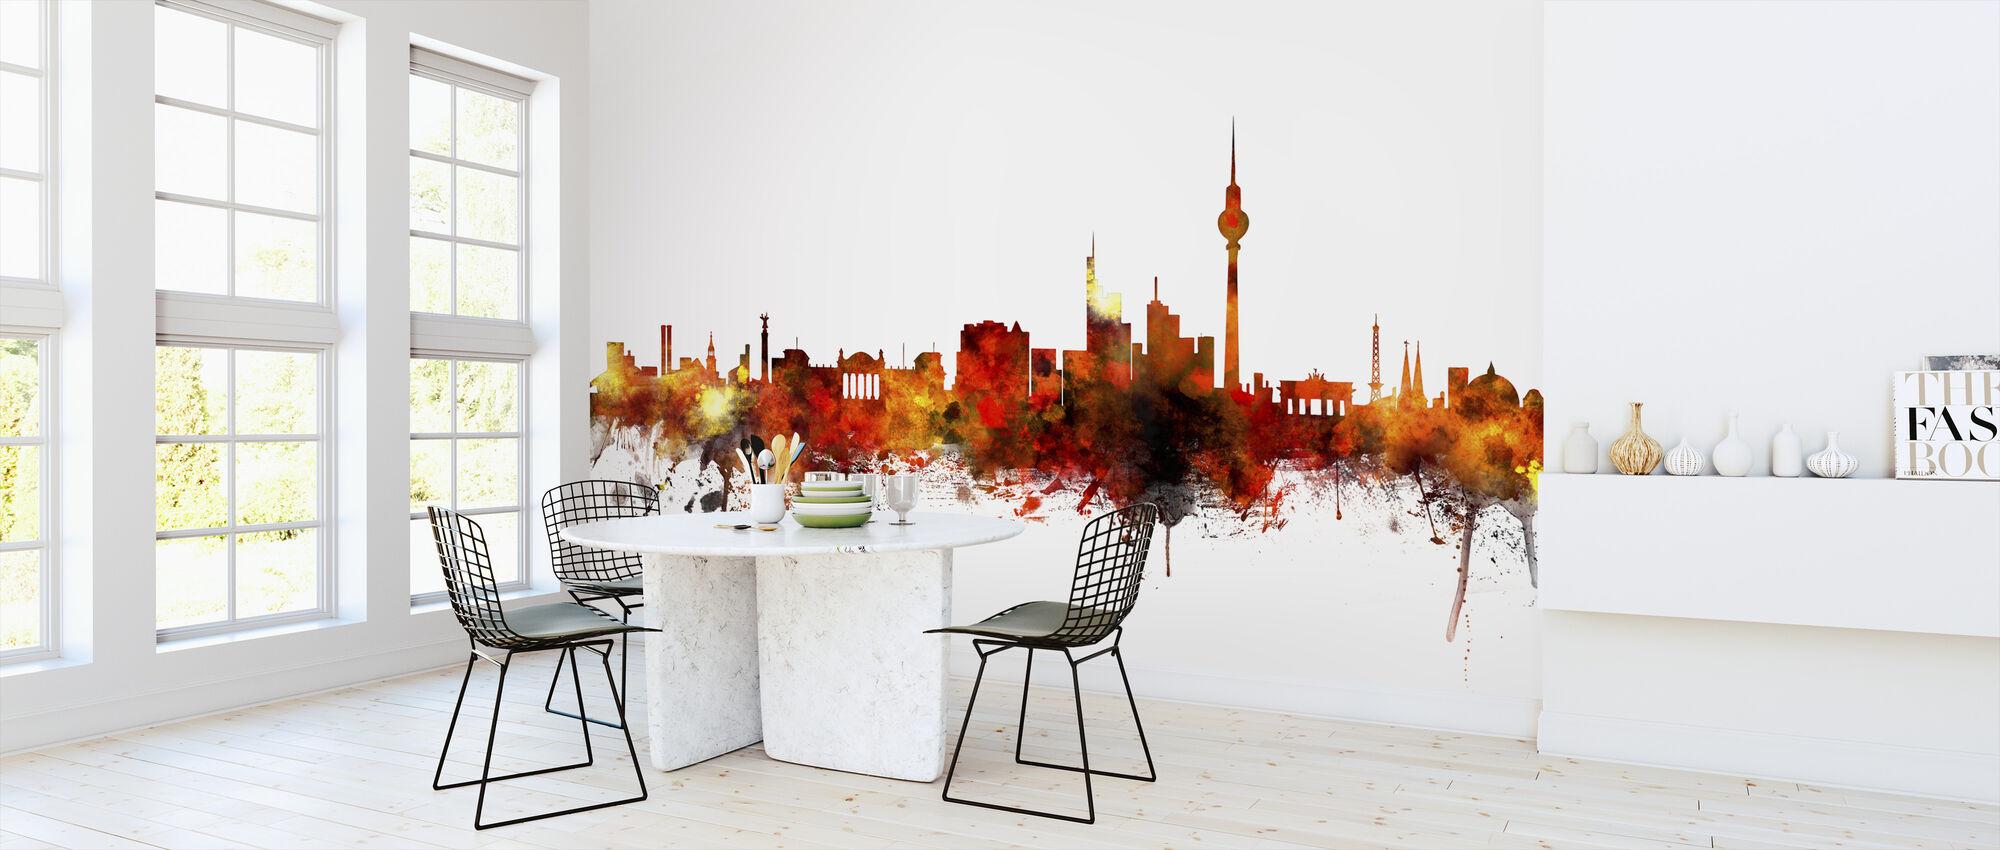 Berlin Skyline 2 - Wallpaper - Kitchen